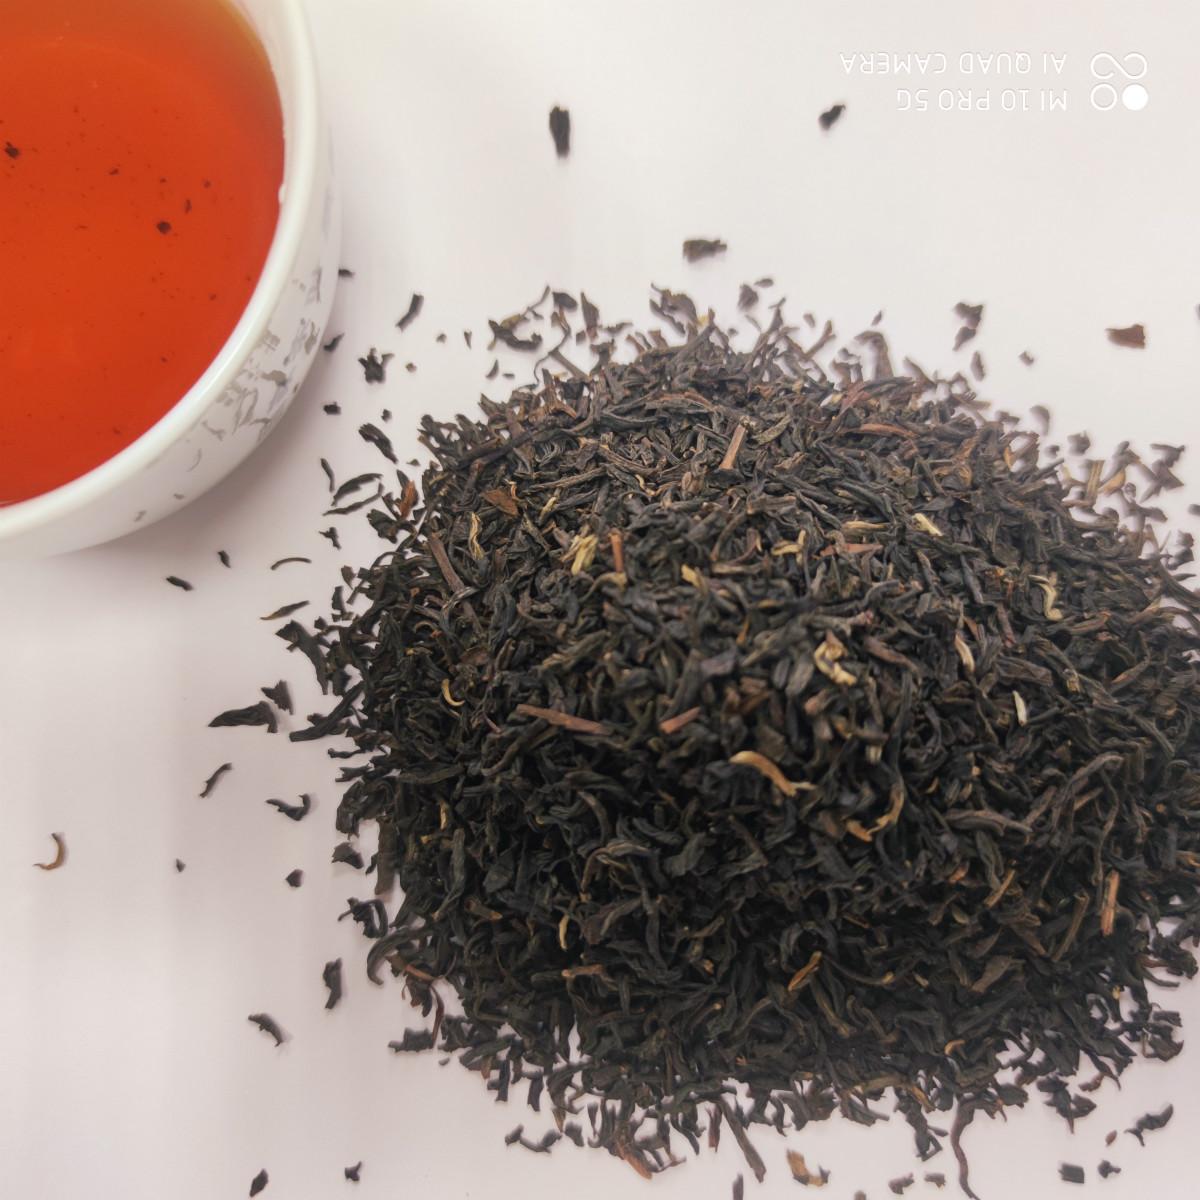 Original factory black tea loose With Lowest Price - 4uTea | 4uTea.com